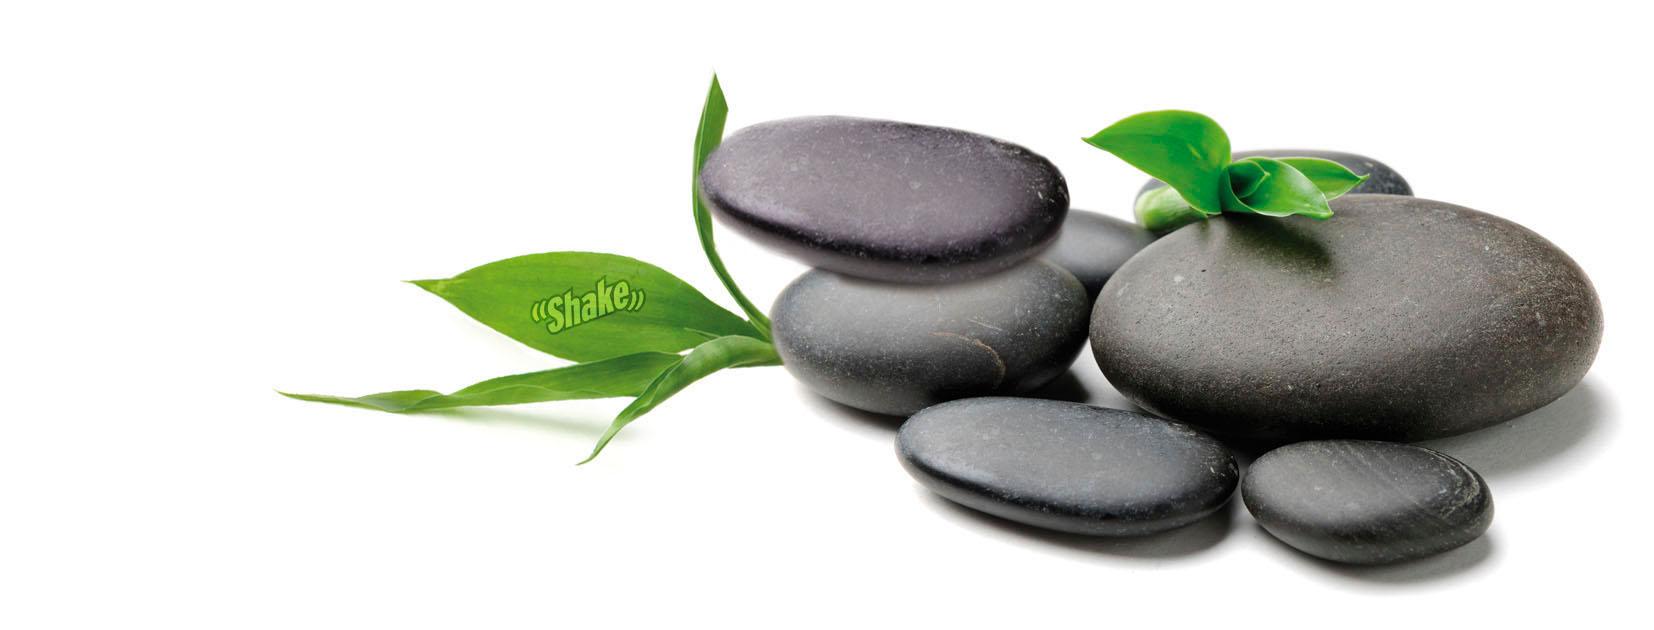 Zen for Salon toilettage zen attitude